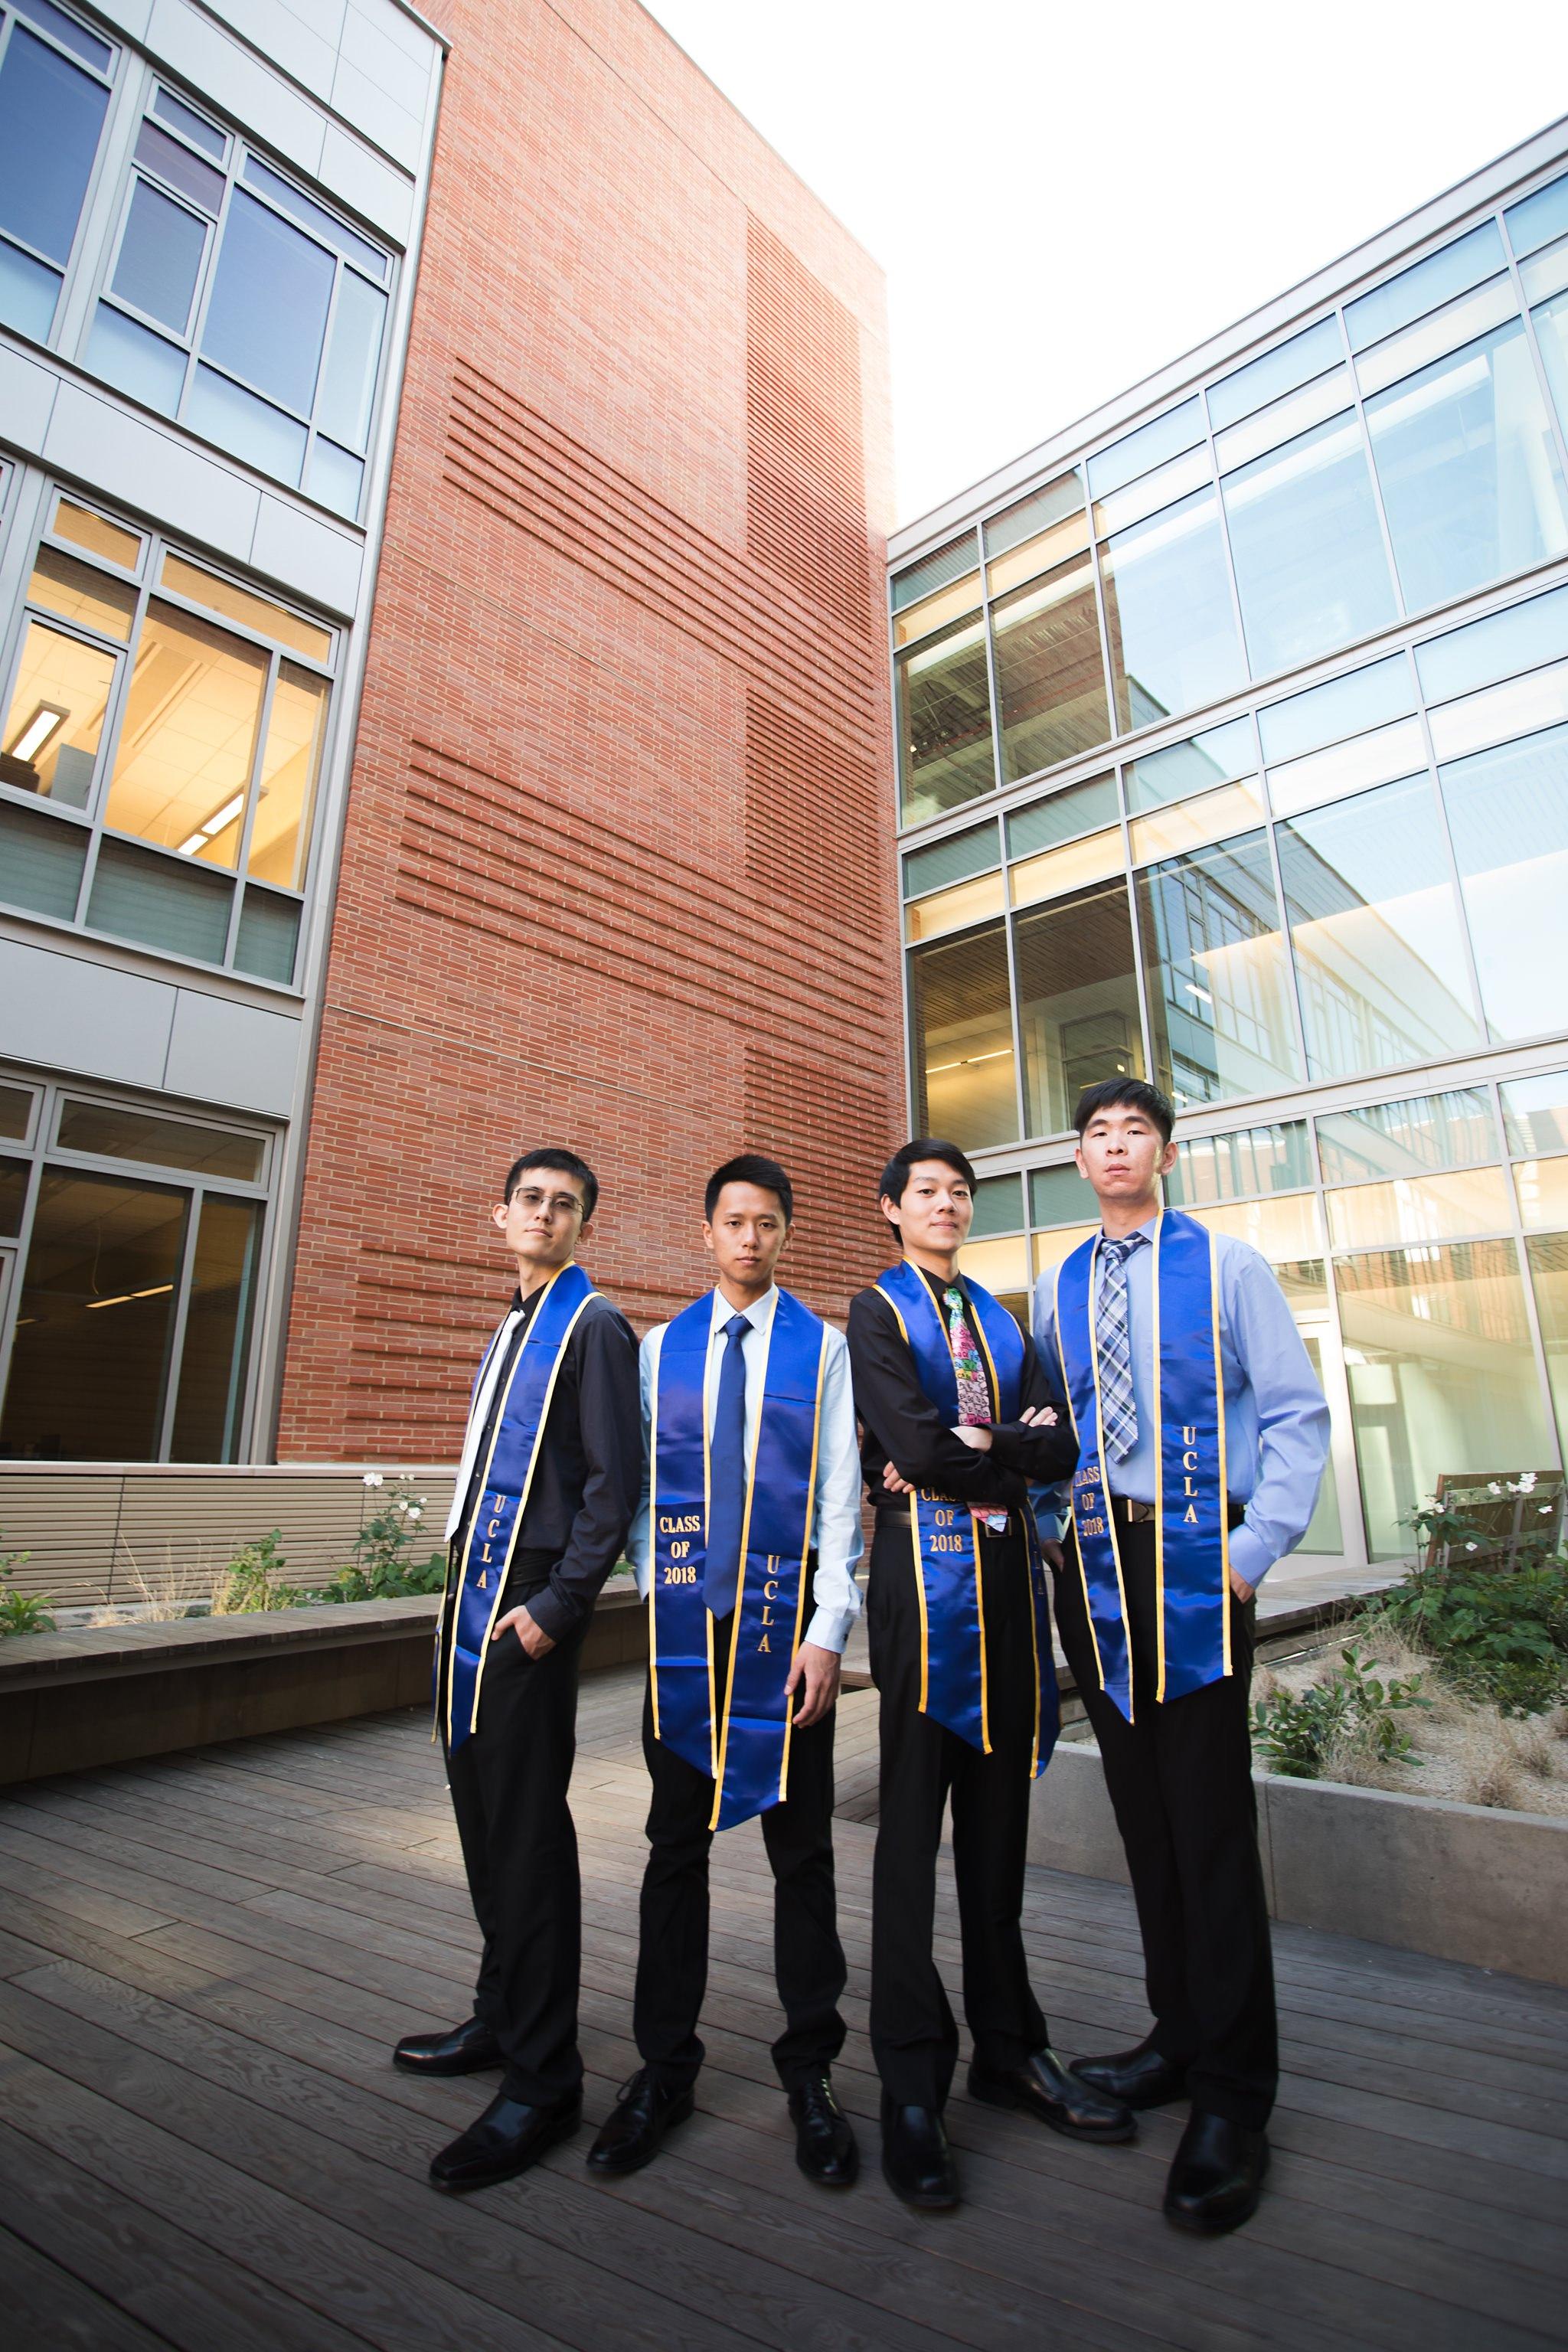 los-angeles-ucla-senior-graduation-portraits-epic-environmental-wide-angle-serious-guys